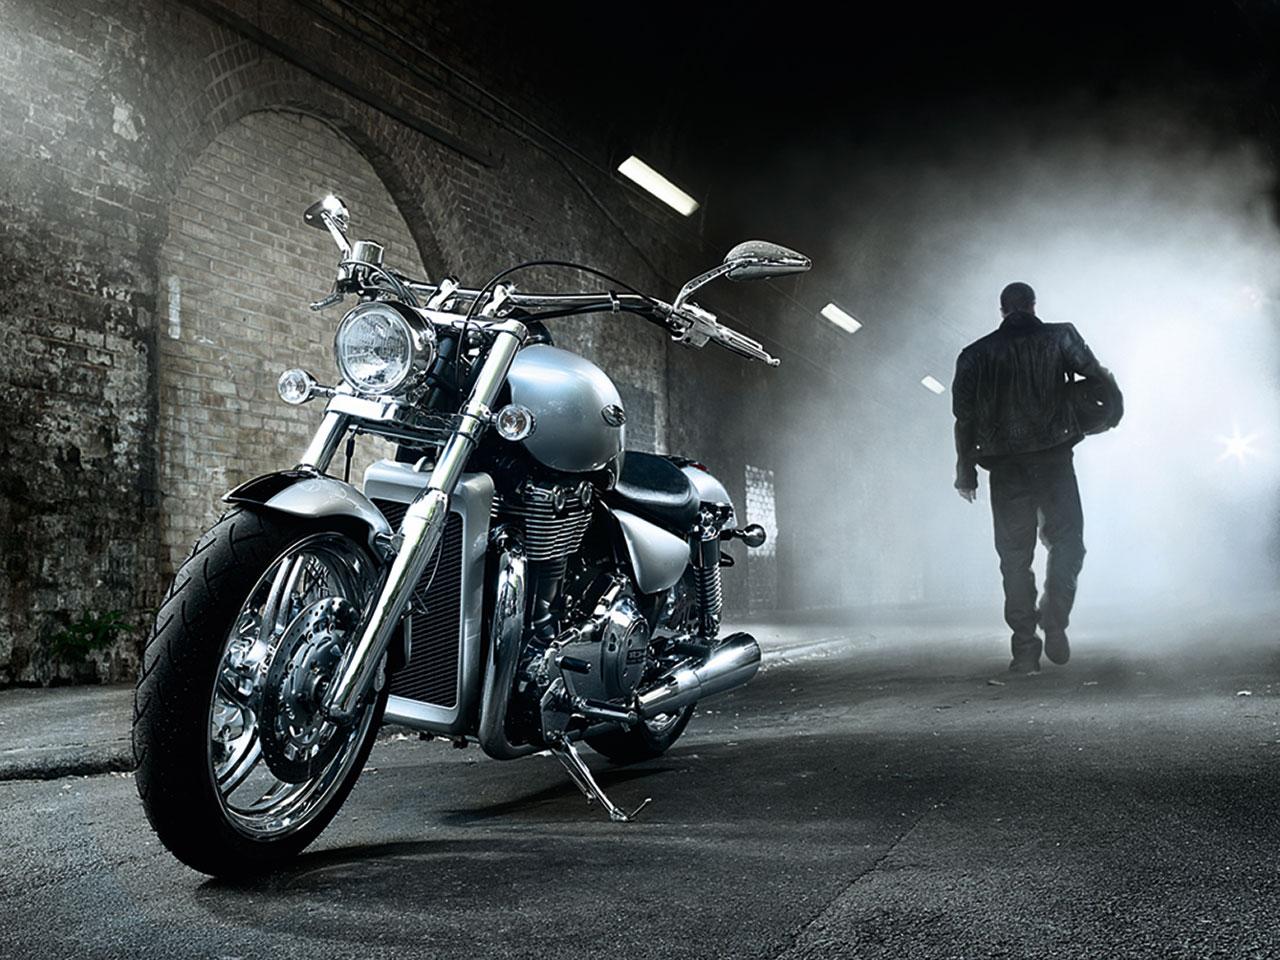 2013 Triumph Thunderbird Storm Specs Motorcycle Image Idea